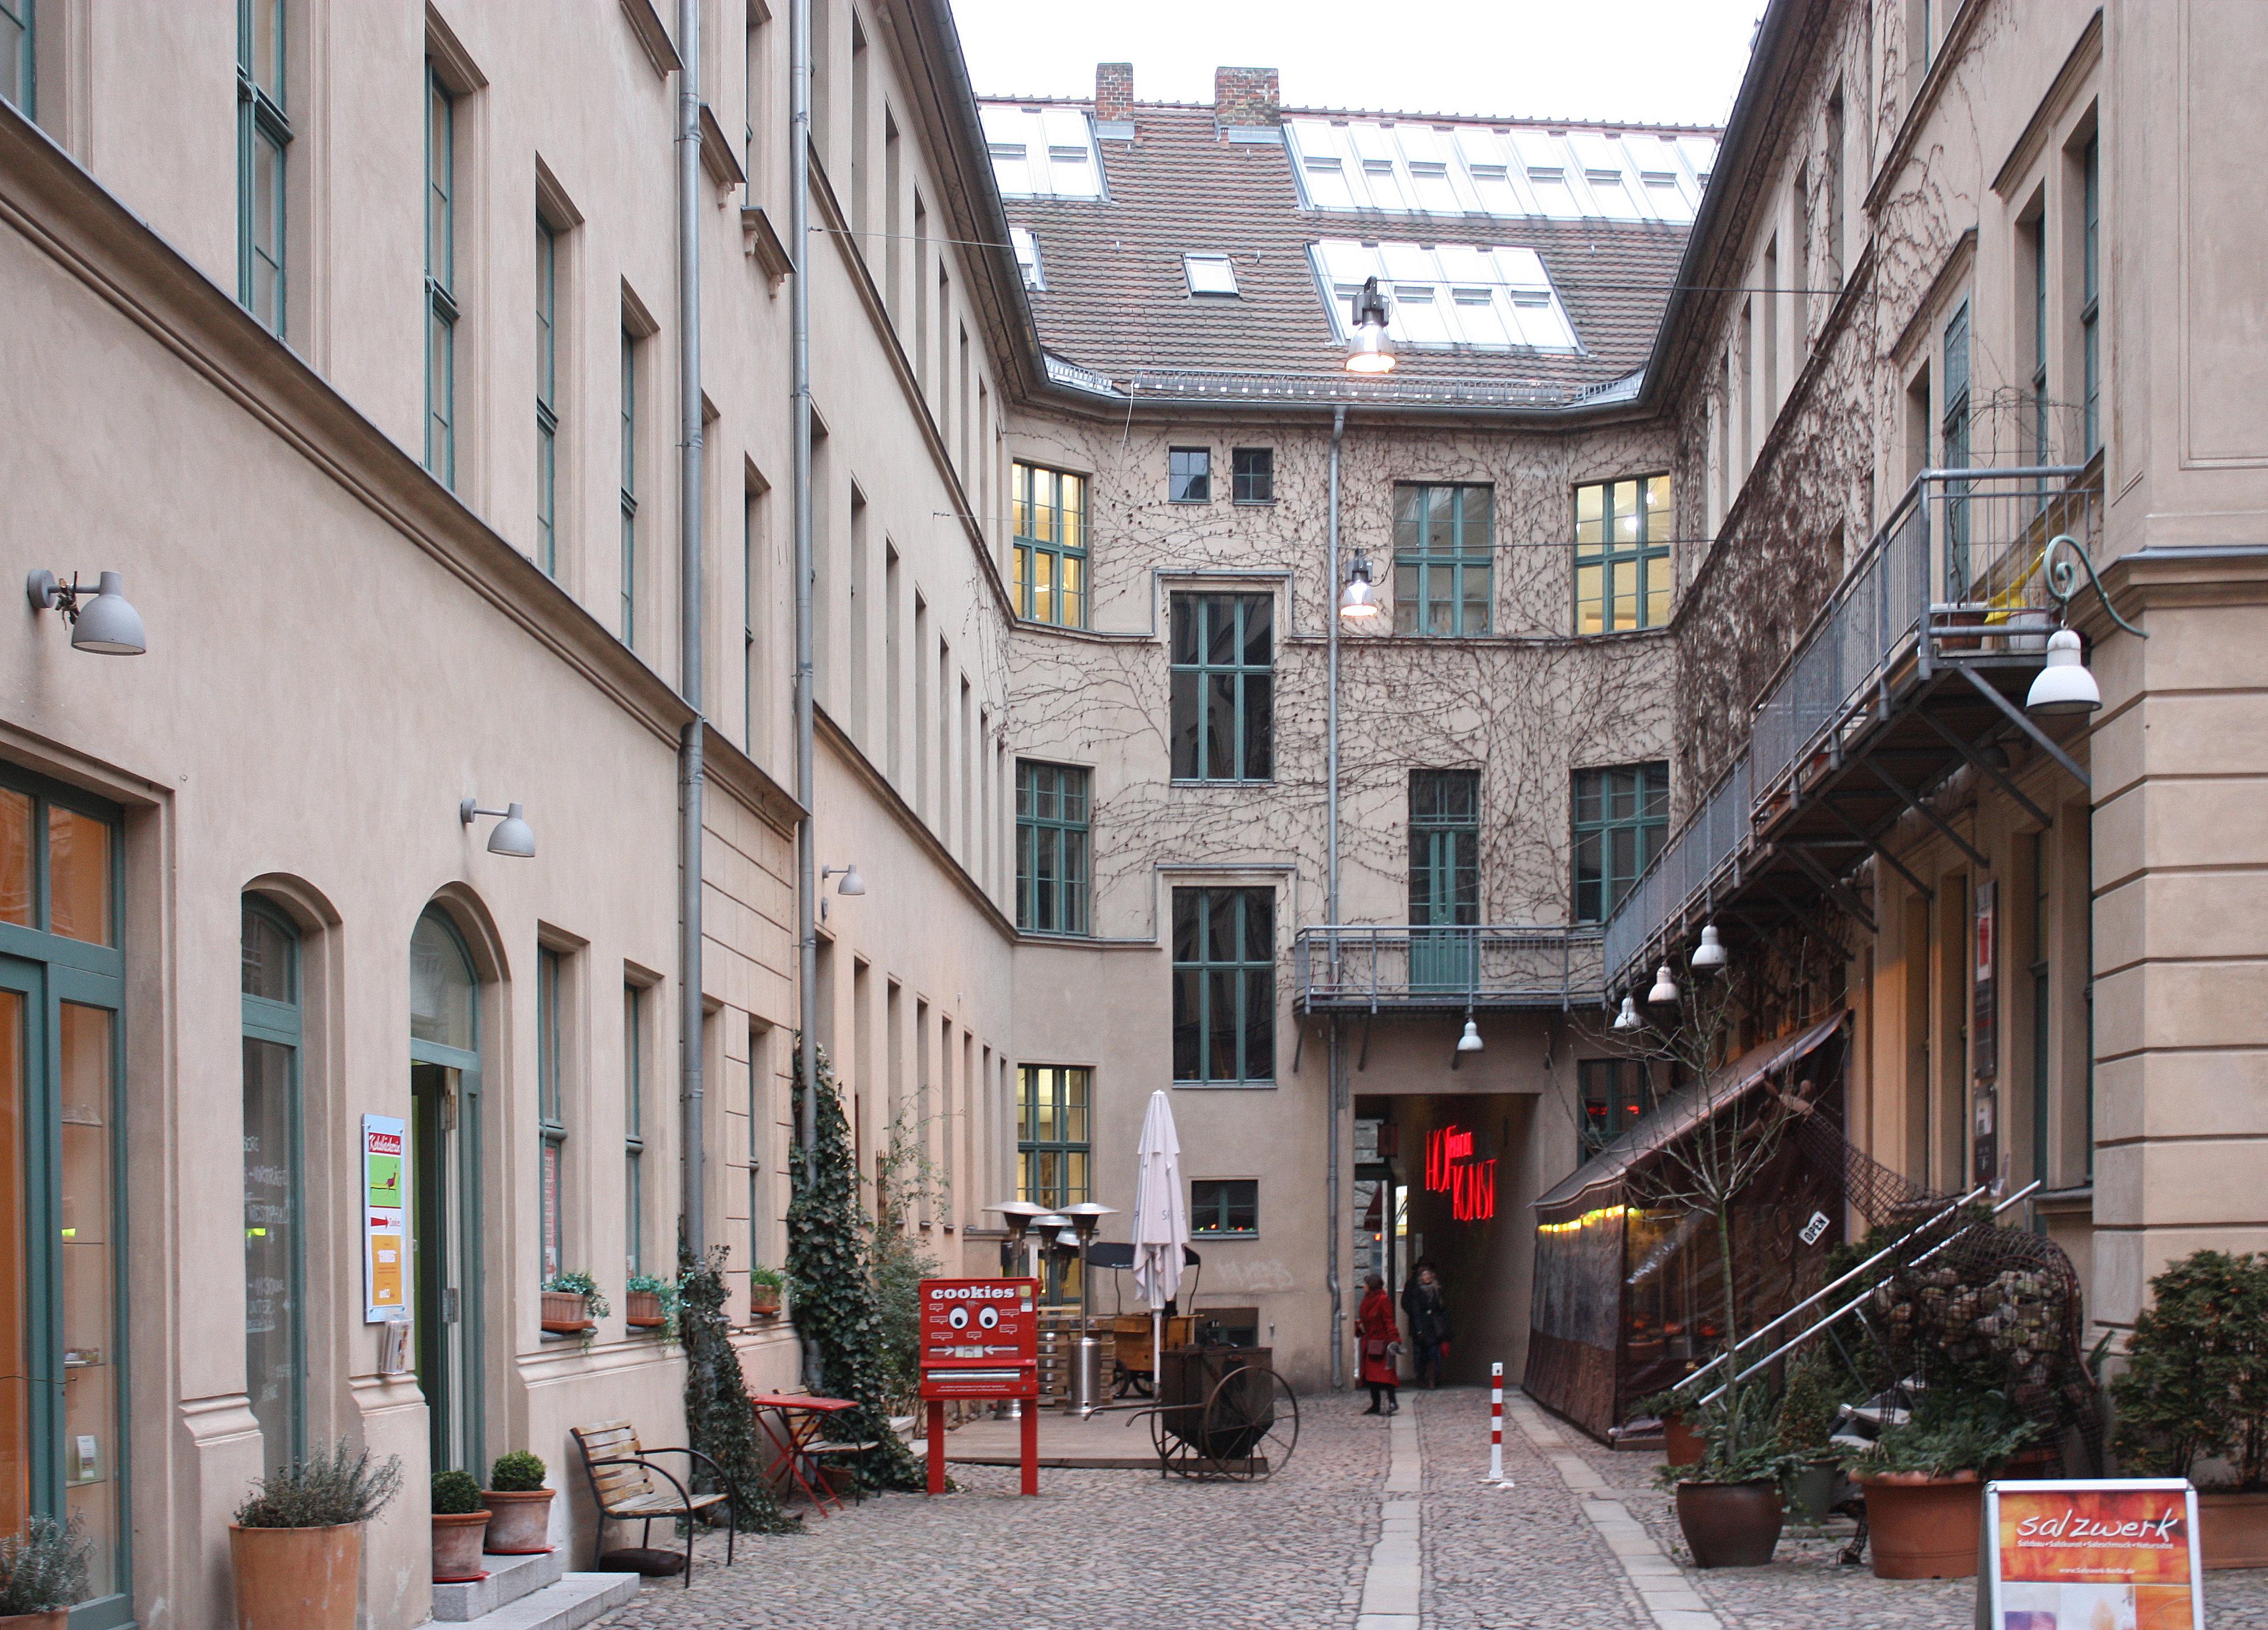 file berlin oranienburger stra e arts courtyard 1 jpg. Black Bedroom Furniture Sets. Home Design Ideas